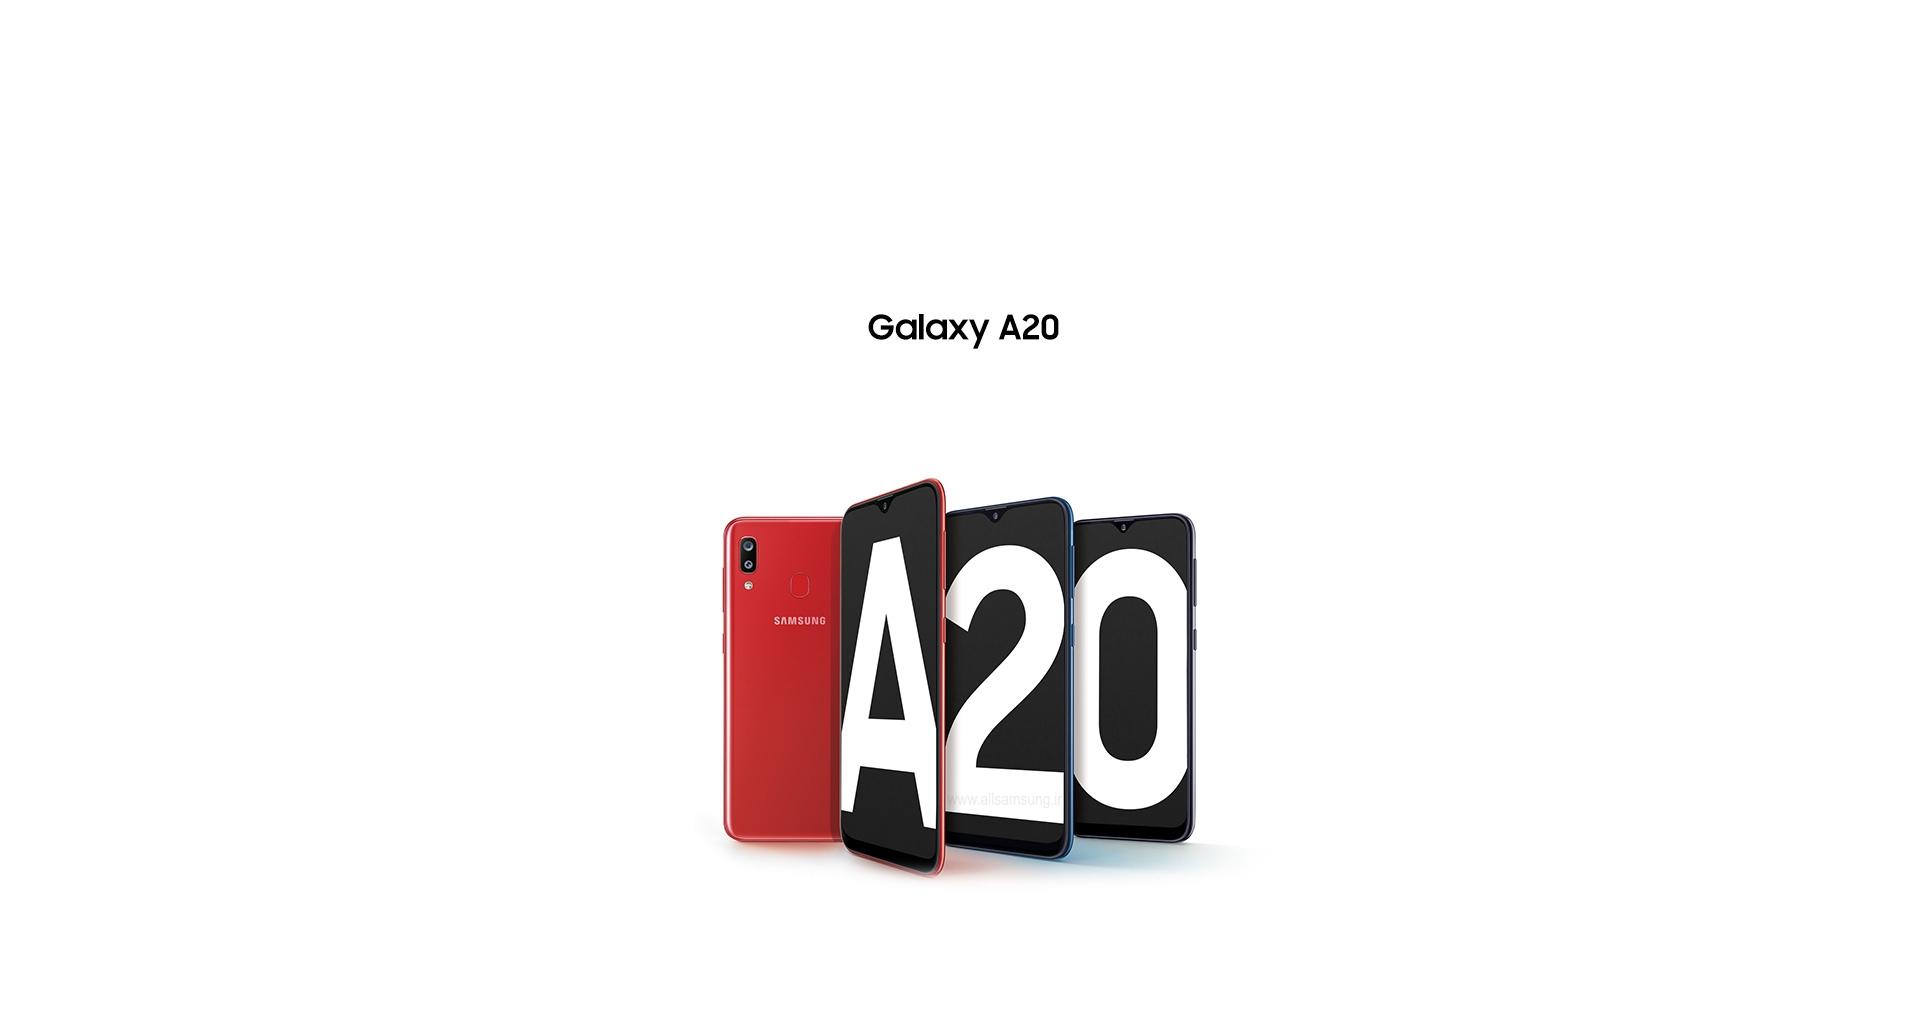 موبایل سامسونگ گلکسی a20